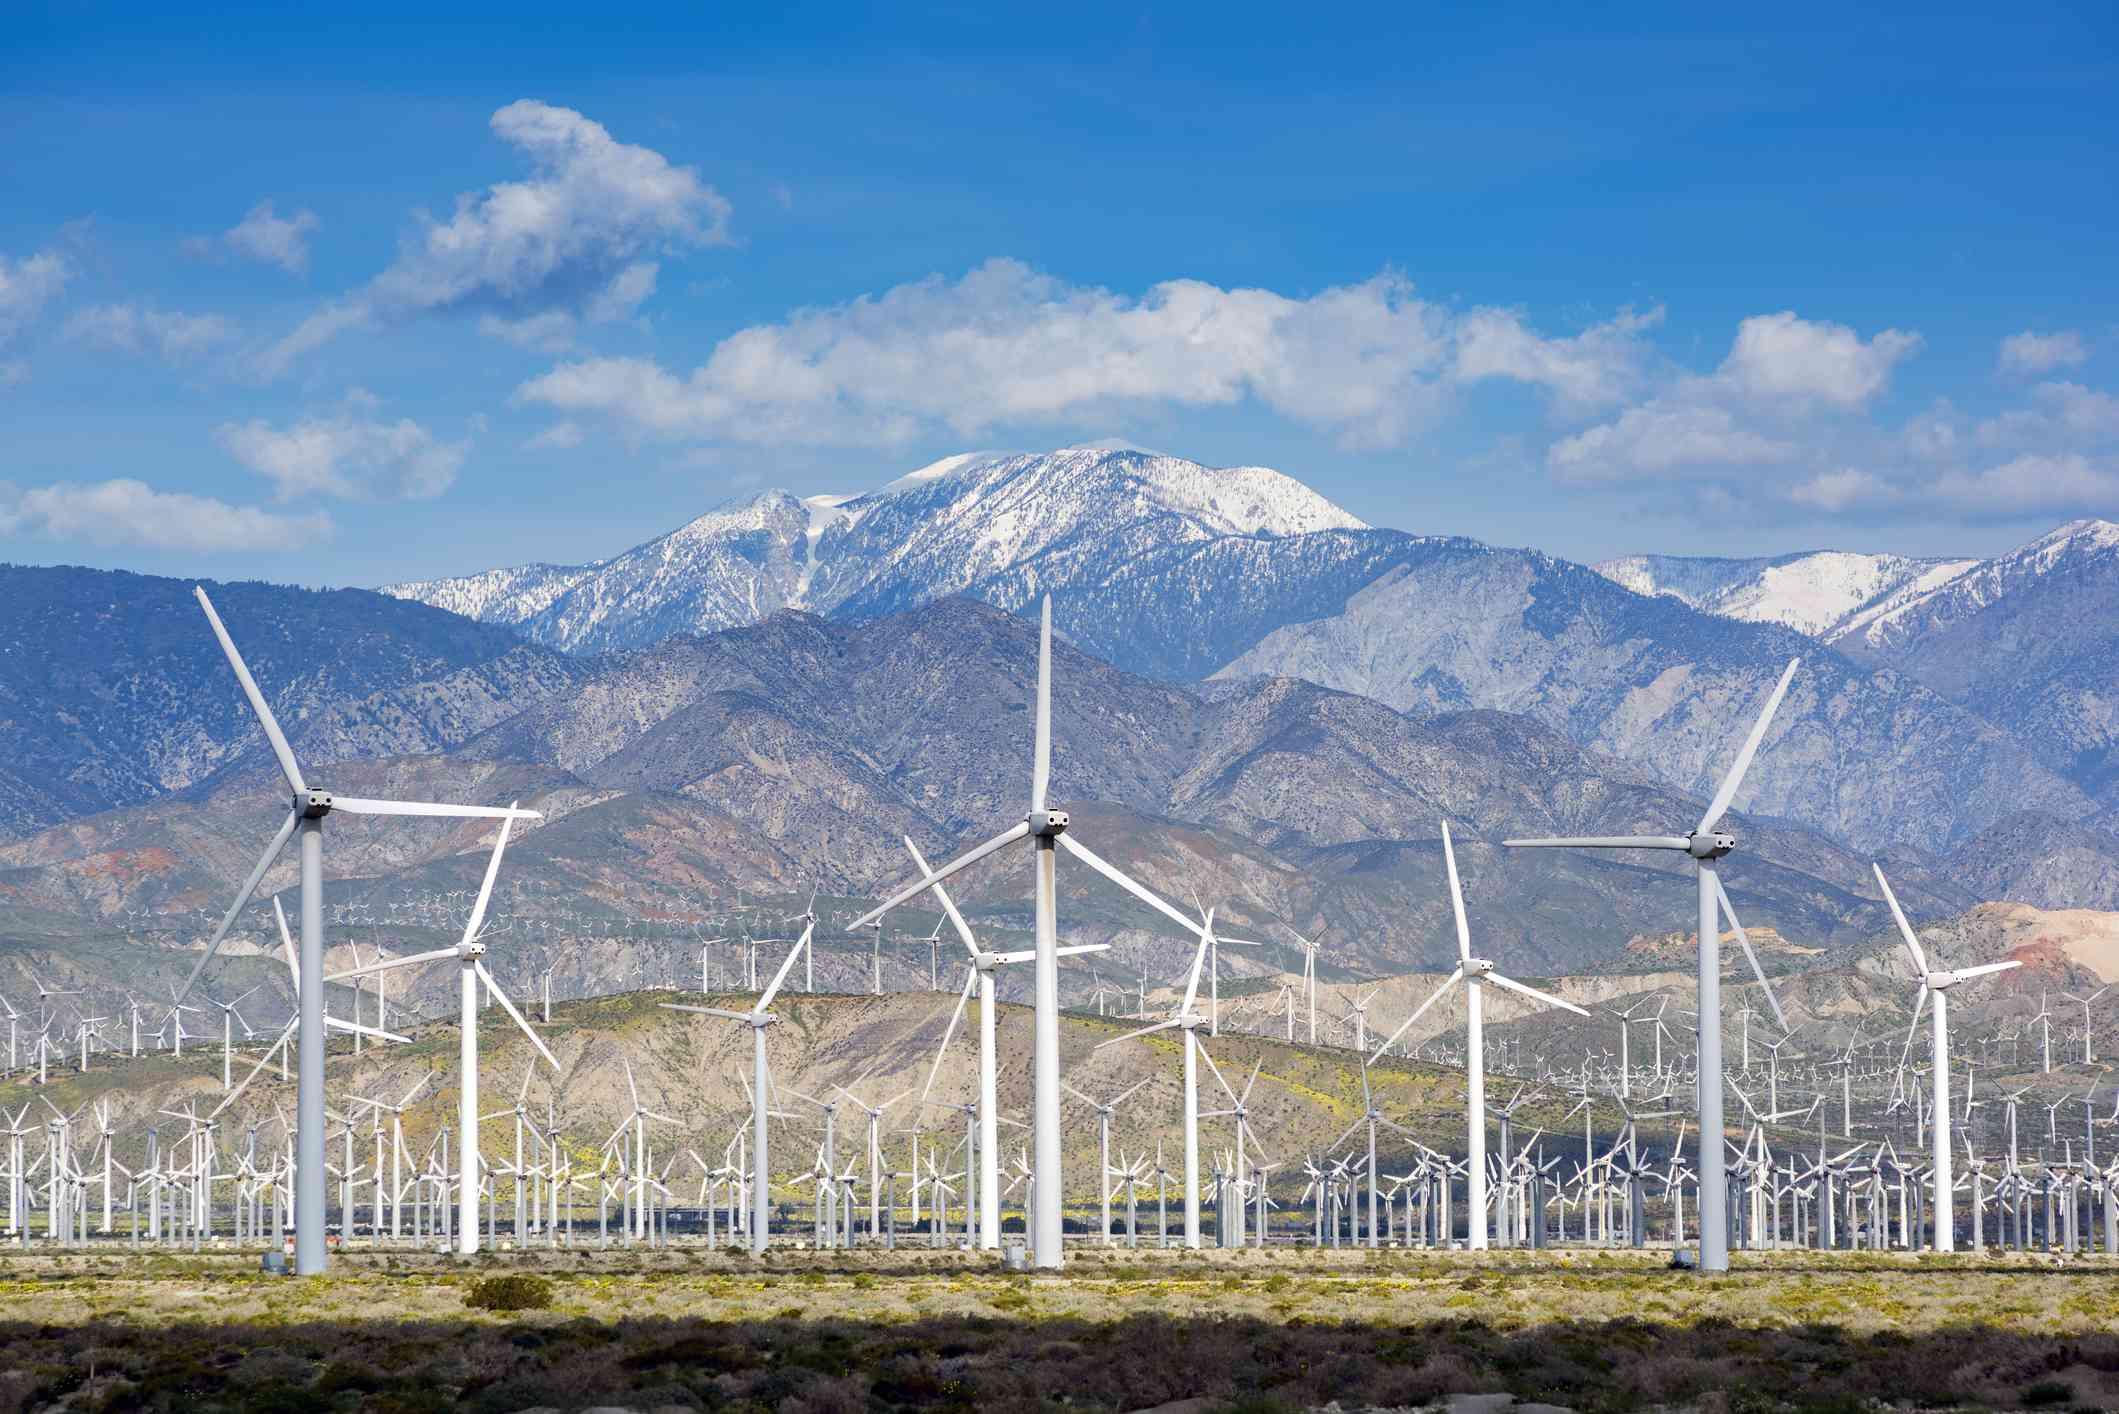 Wind turbines in the San Gorgonio Pass near Palm Springs